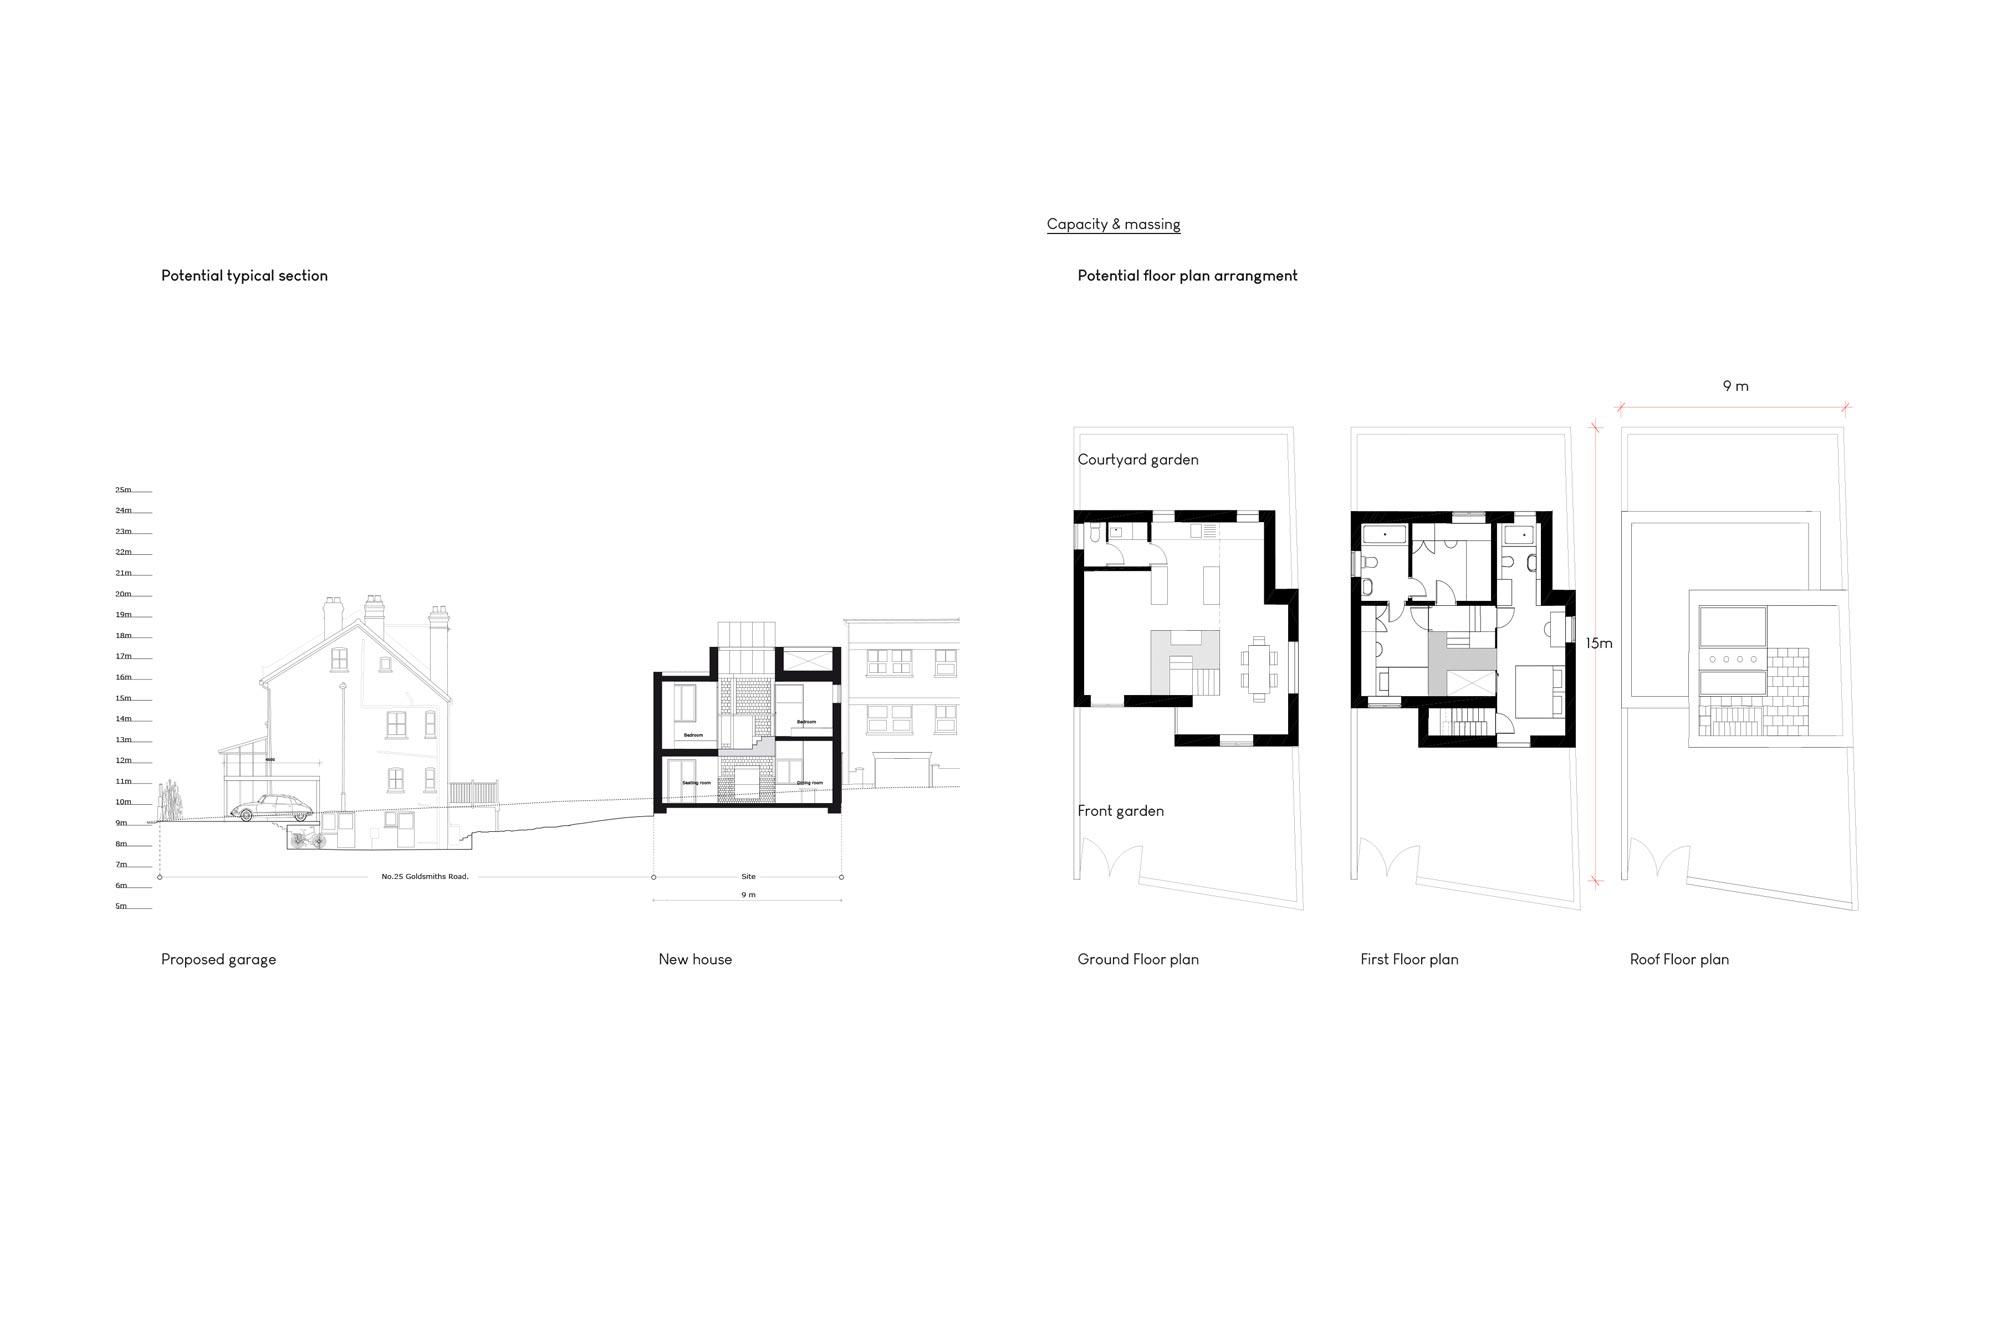 cube-haus-scdlp-n11-cs-2000×1332-04